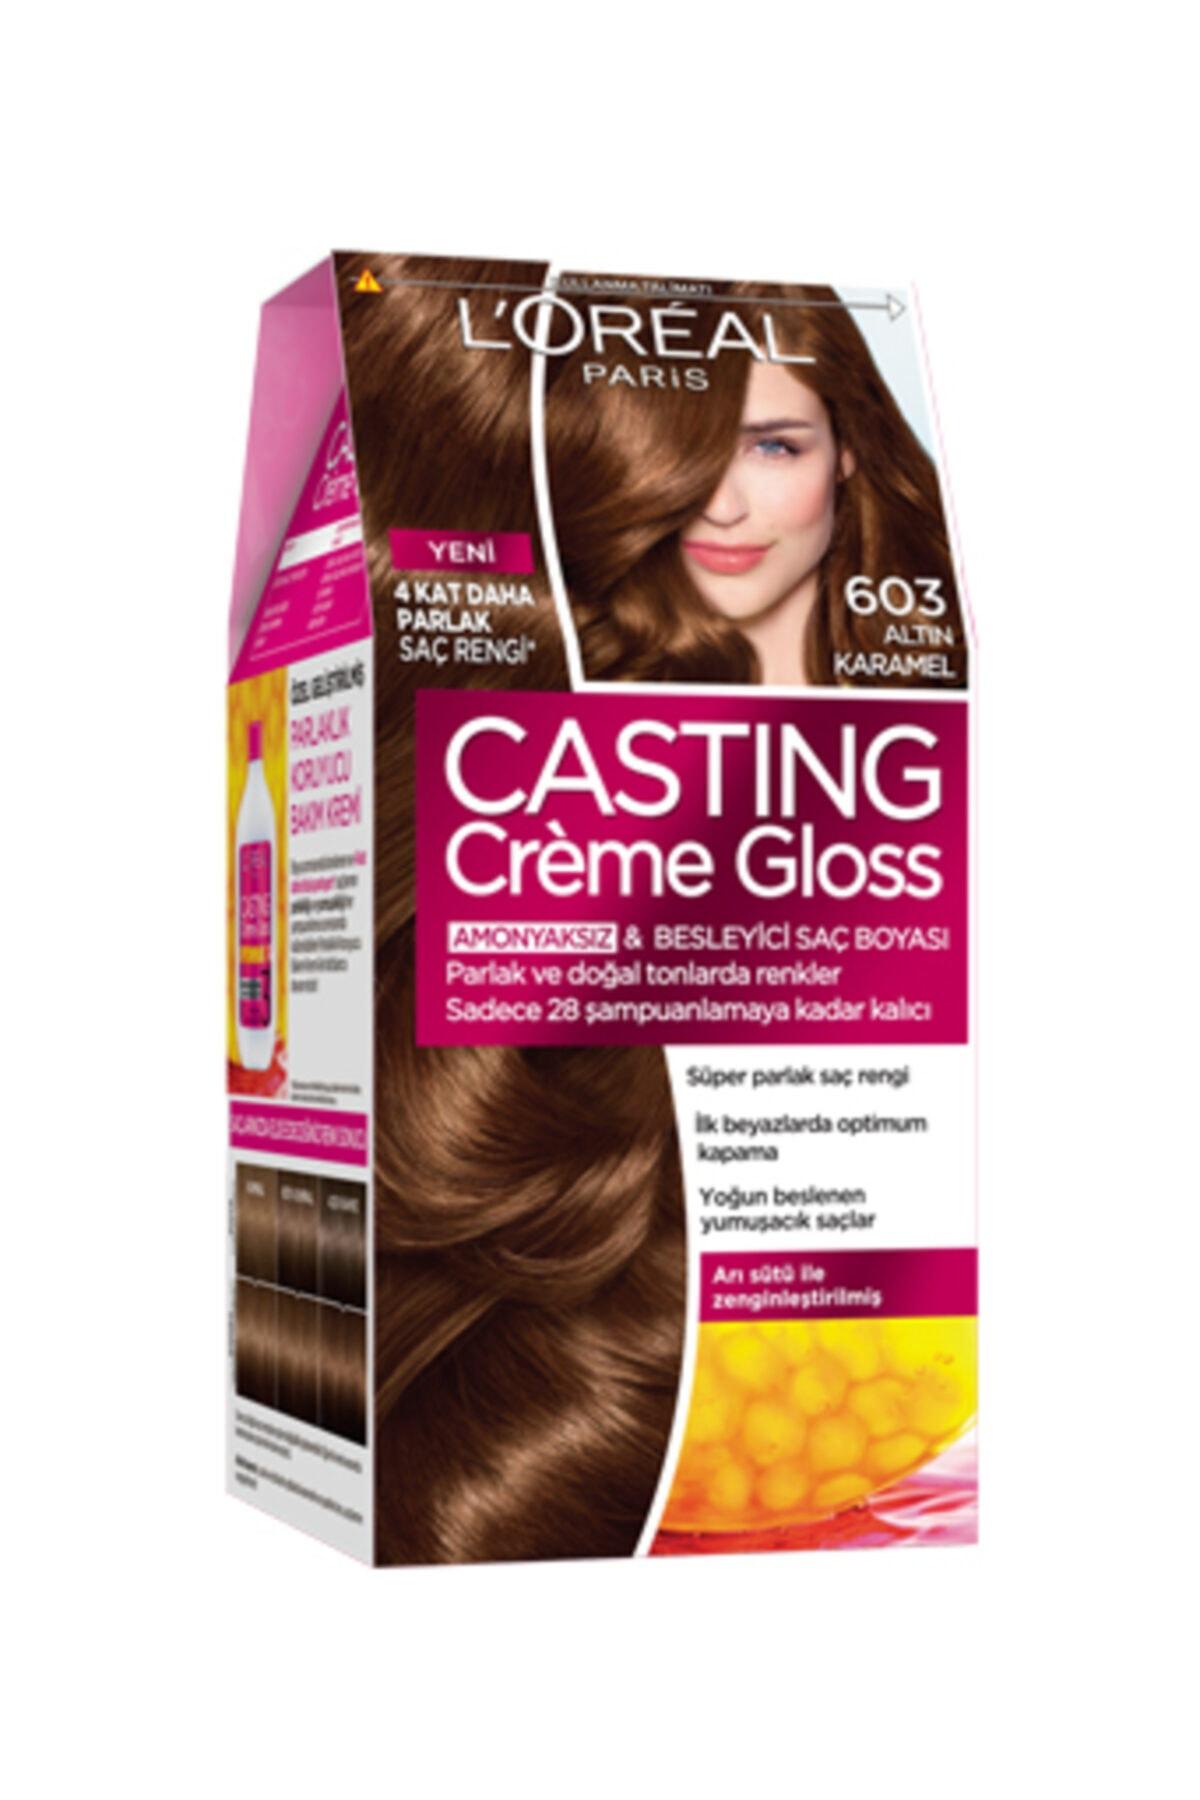 L'Oreal Paris Casting Creme Gloss Saç Boyası 603 Altın Karamel 1